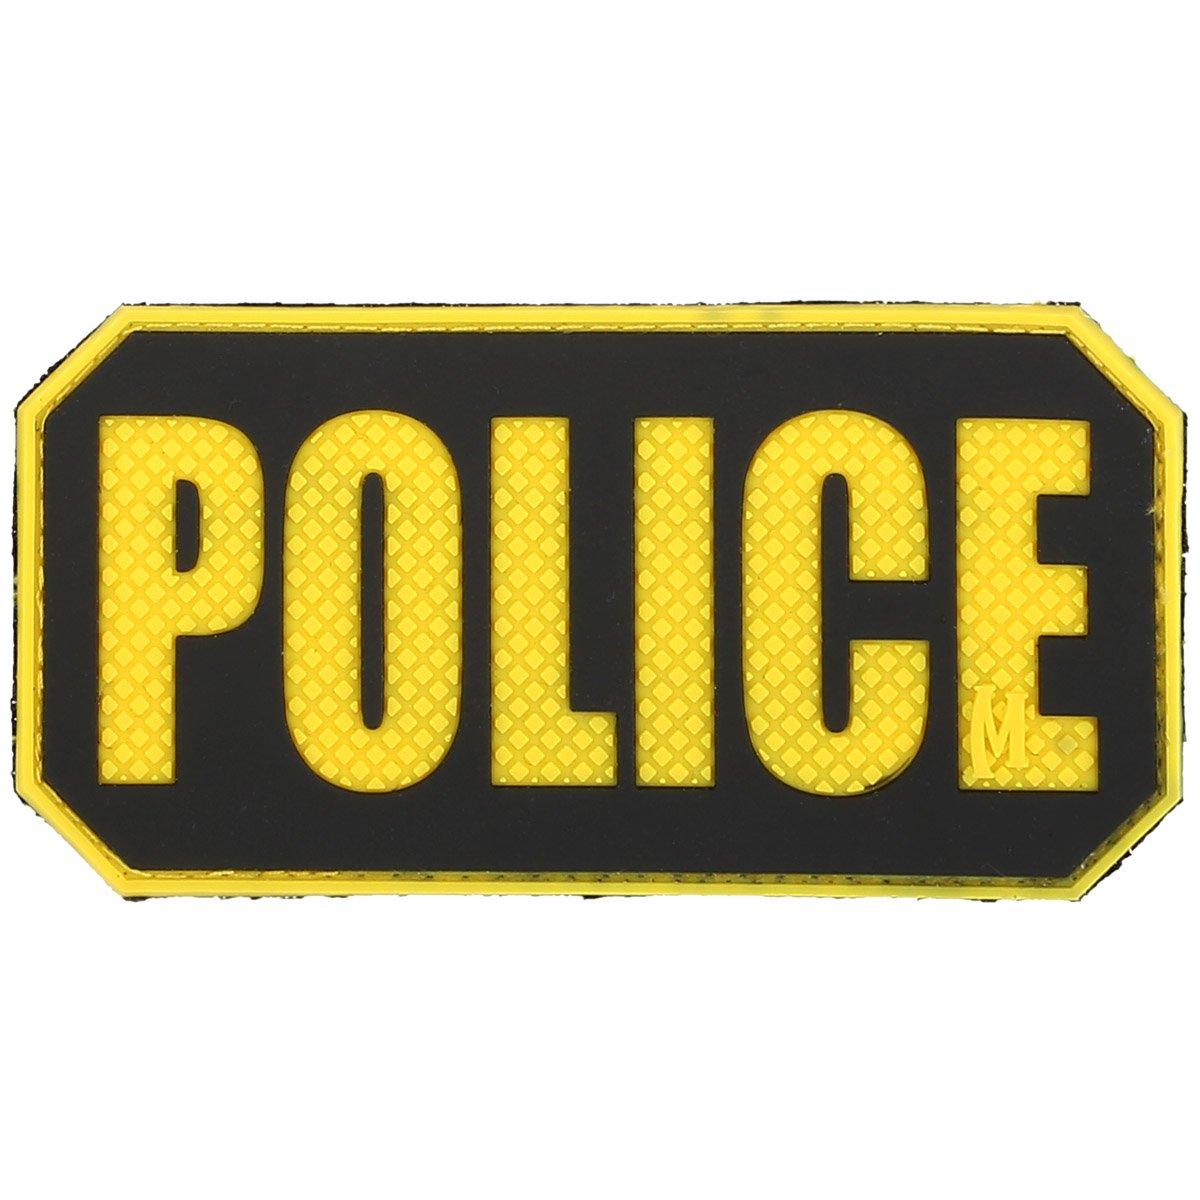 Maxpedition Gear Police Identification Patch maxpedition органайзер в петербурге